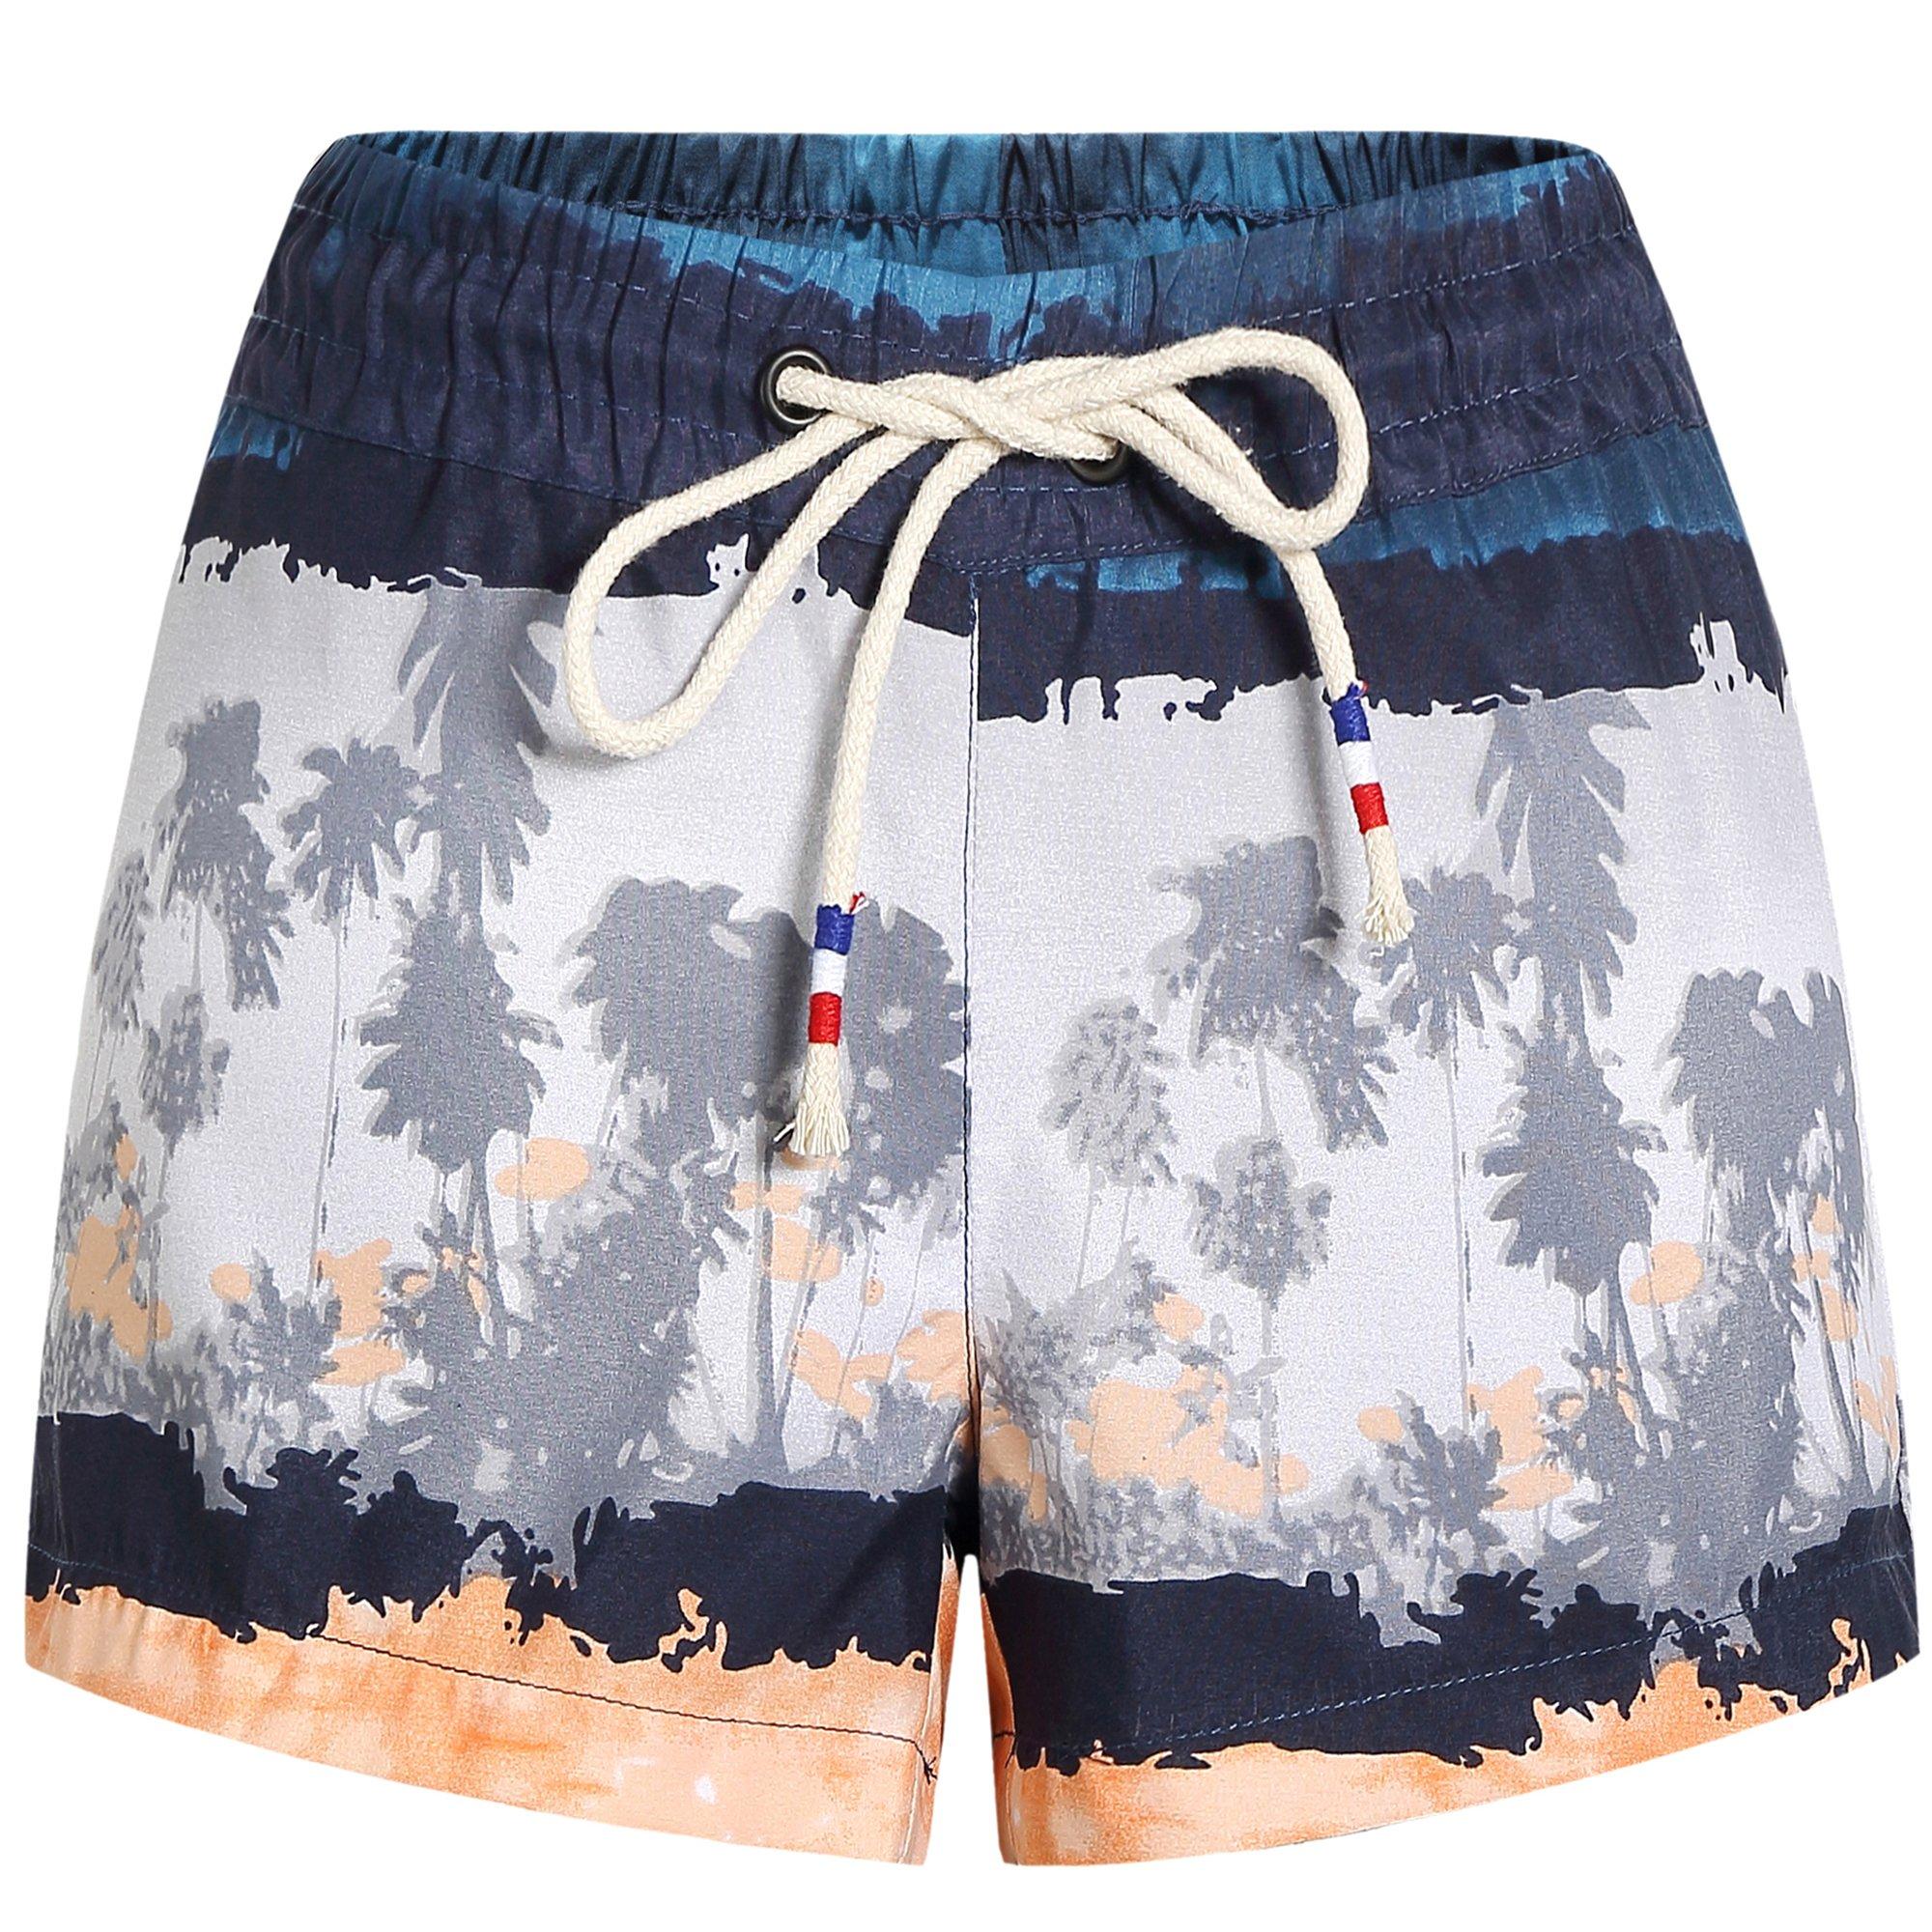 SSLR Women's Beach Shorts Swimming Casual Hawaiian Aloha Board Shorts (30, Blue Grey)